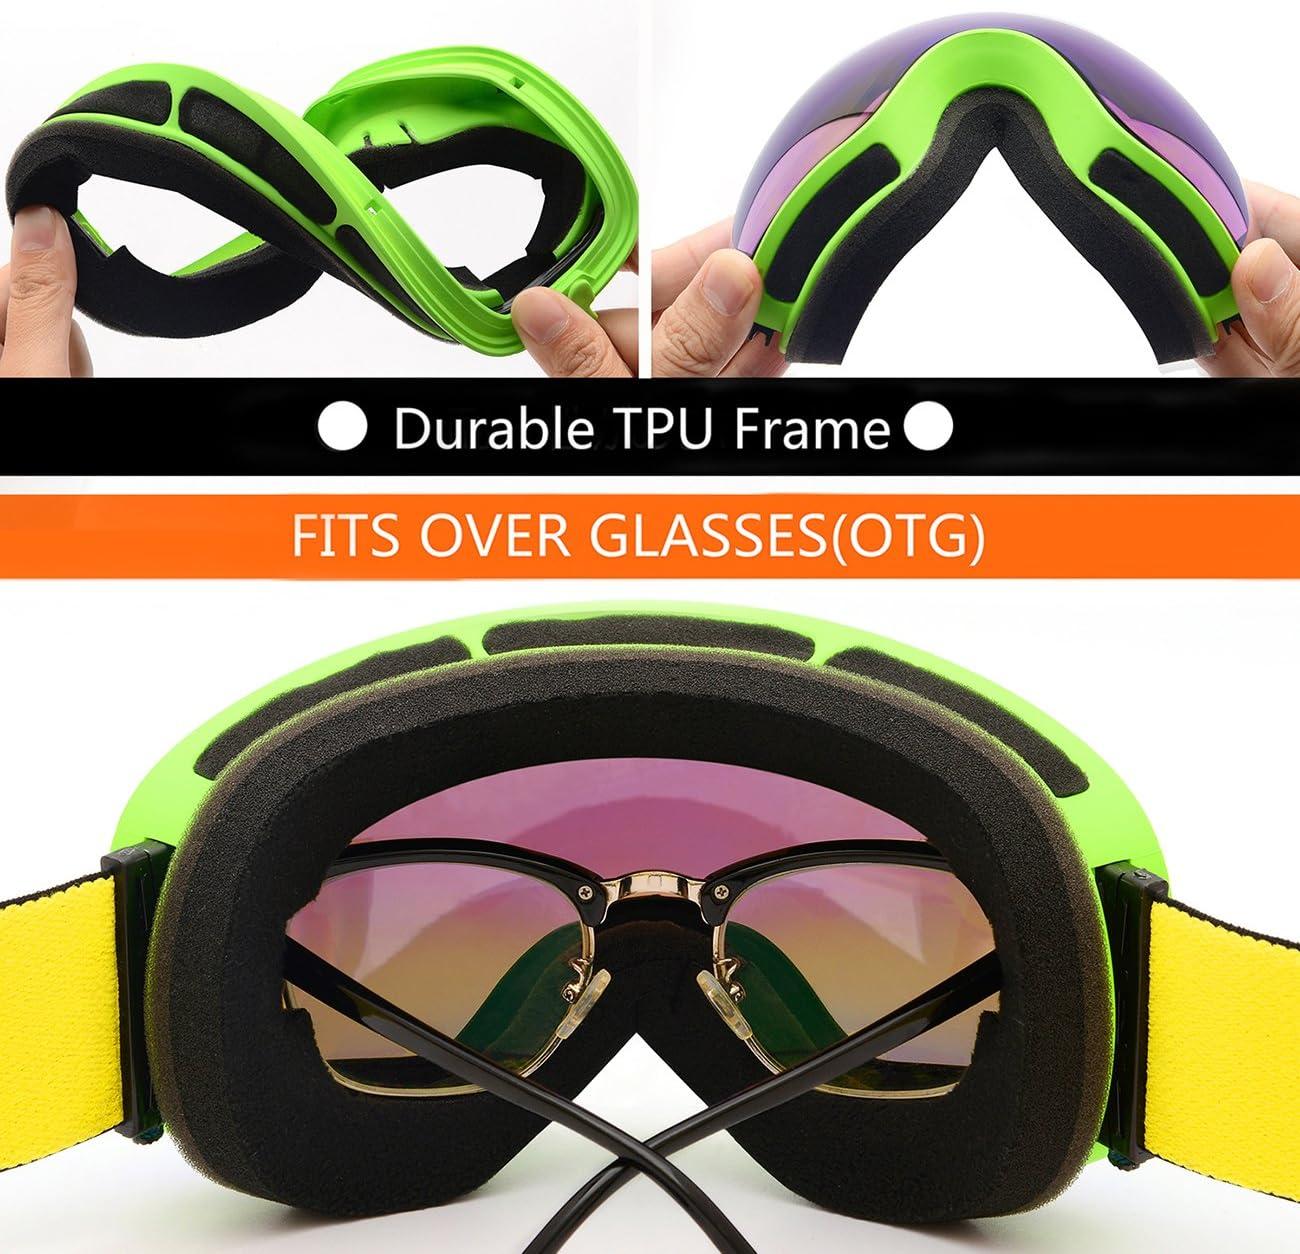 Snowboard Goggles UV Protection Hongdak Ski Goggles Snow Goggles Helmet Compatible for Men Women Boys Girls Kids Anti